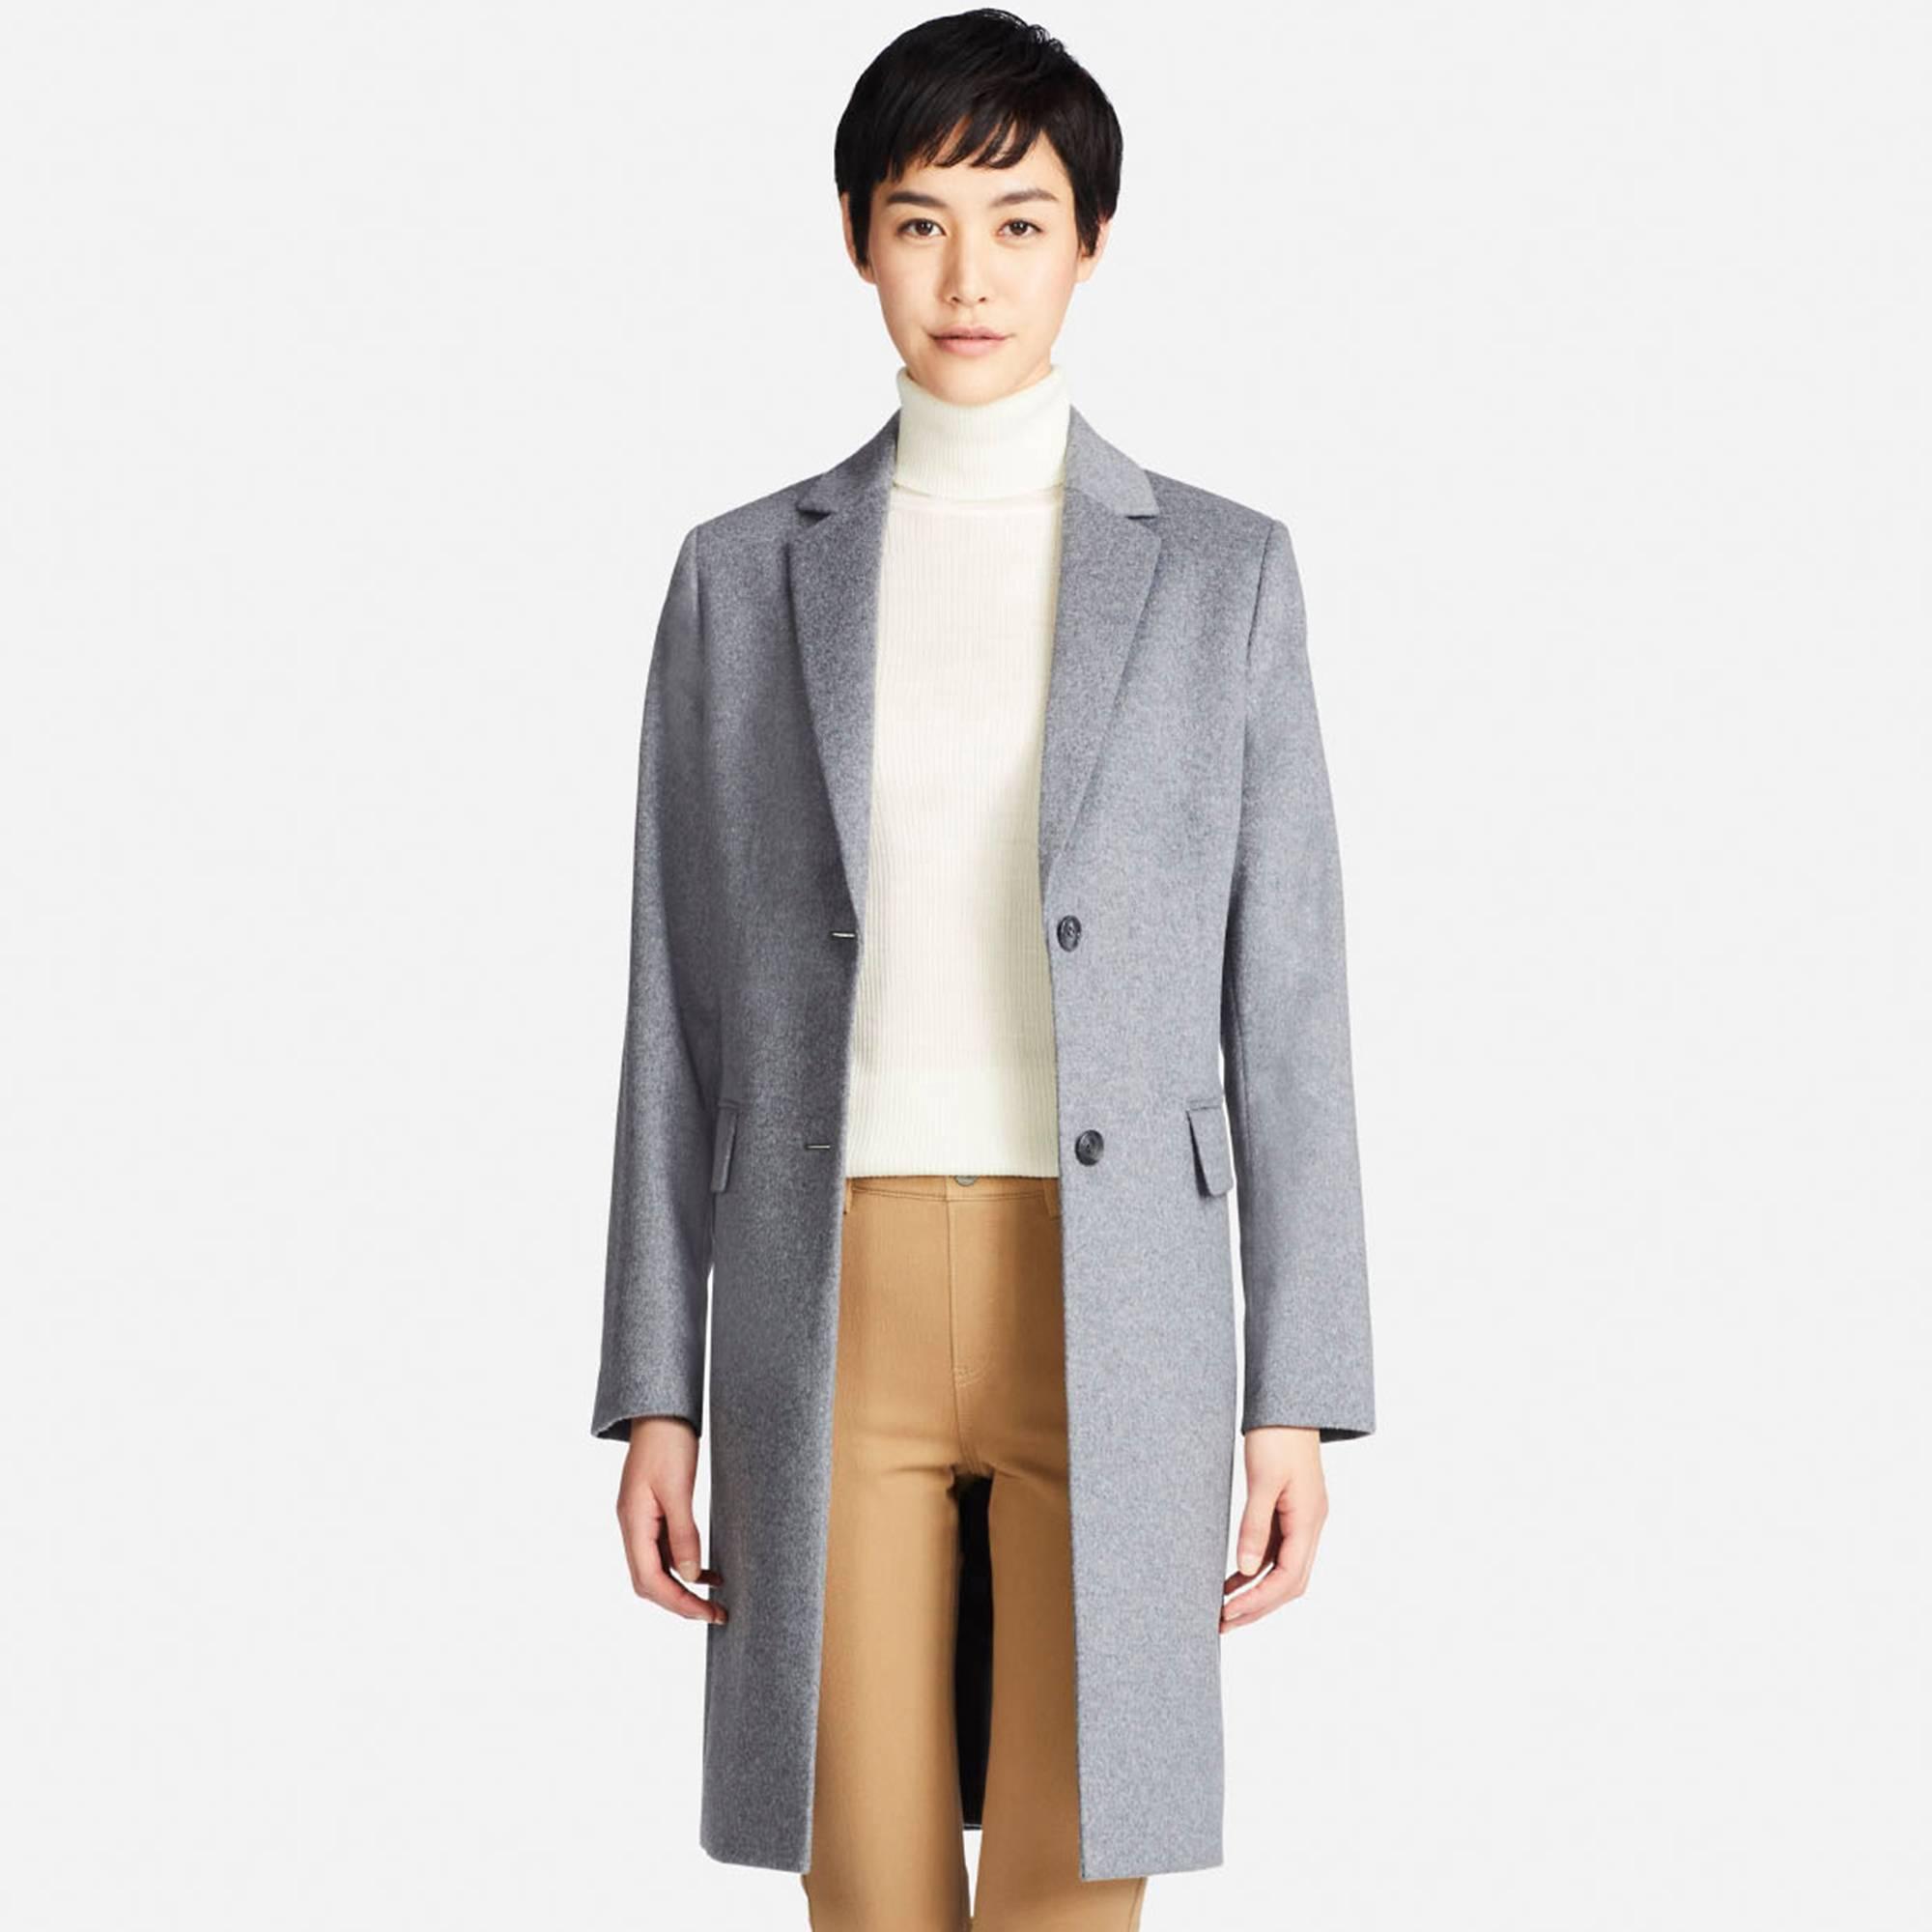 Handmade Cashmere Coat for All Seasons